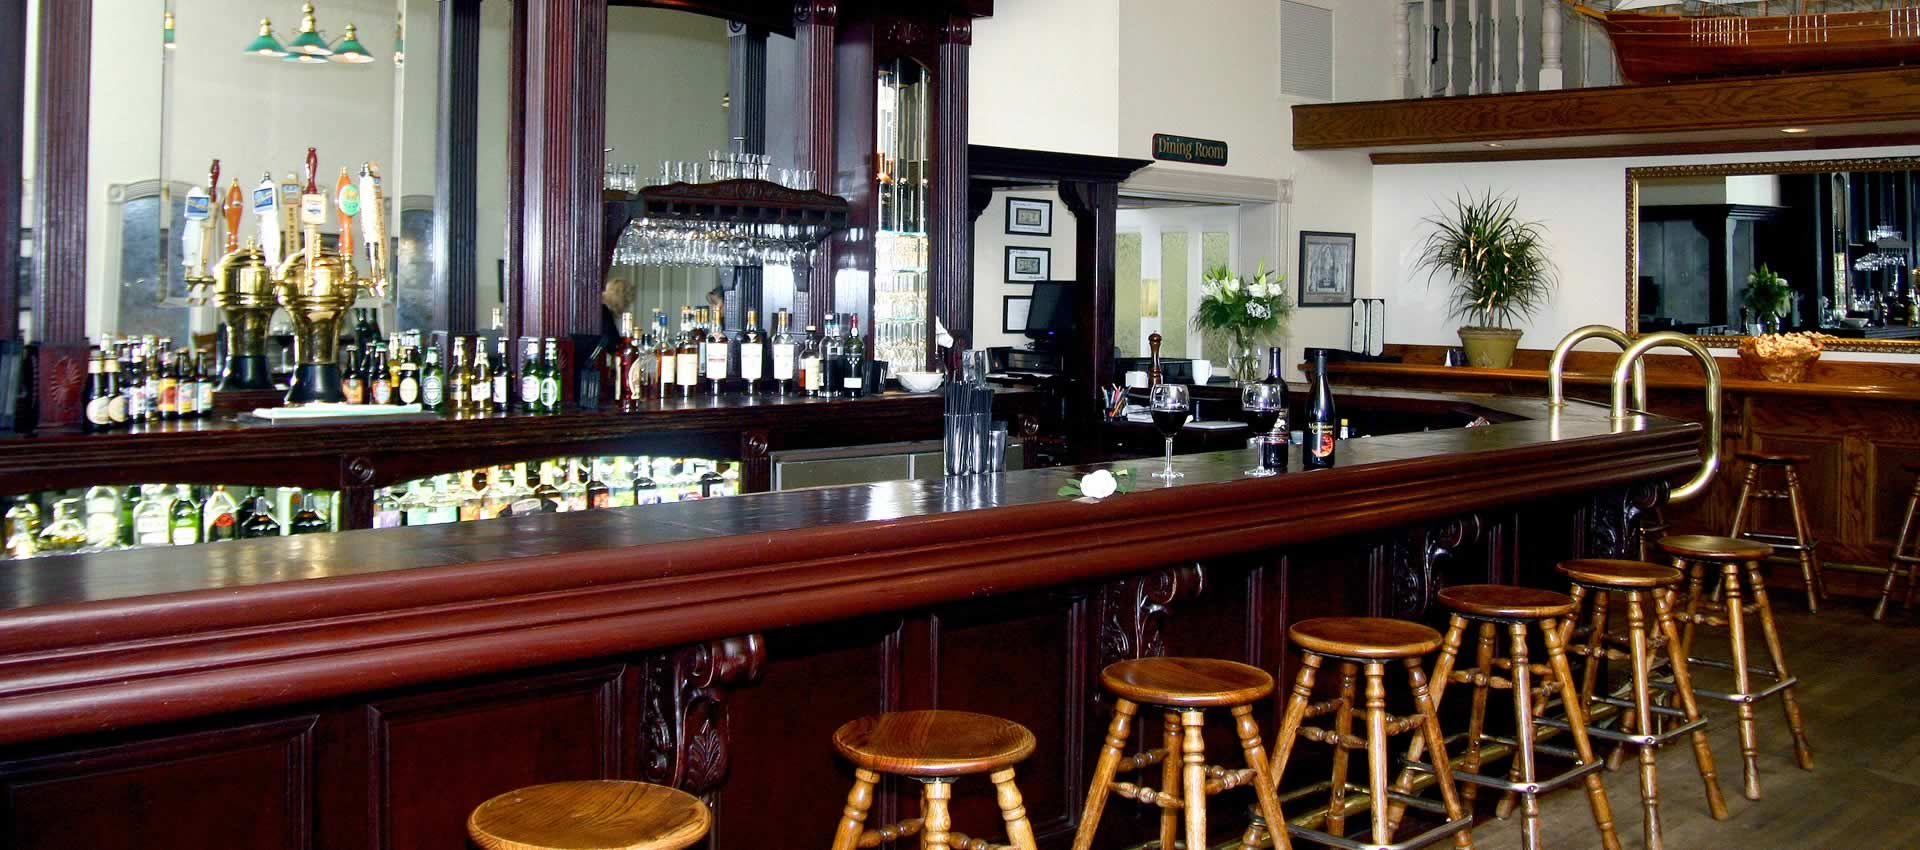 Redwood Suites - Victorian Inn bar